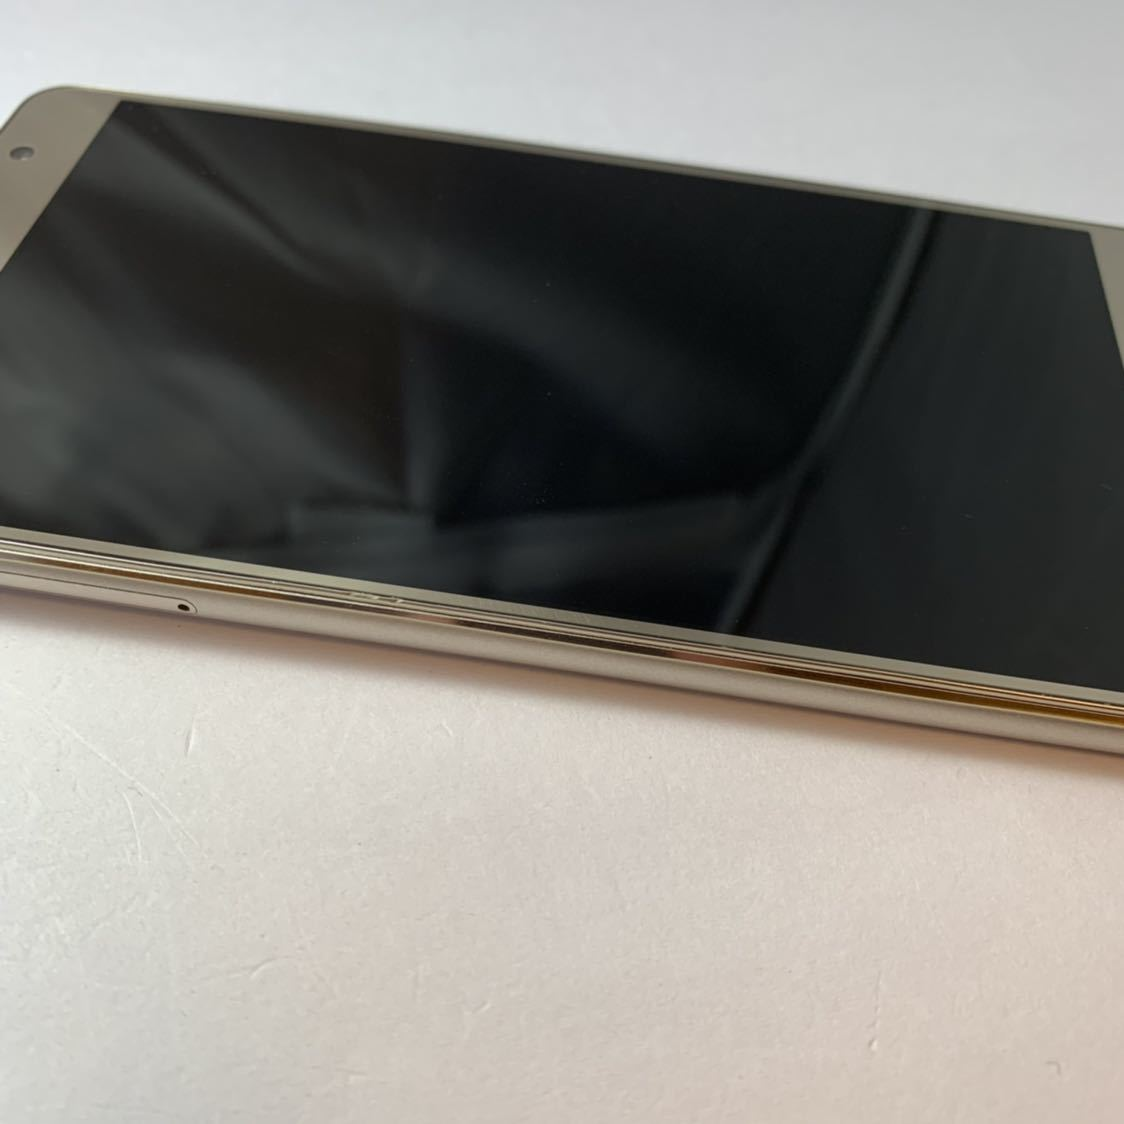 ASUS Zenfone 3 Deluxe 5.5 ZS550KL 64GB SIMフリー 本体 Z01FD ゴールド 海外版_画像6